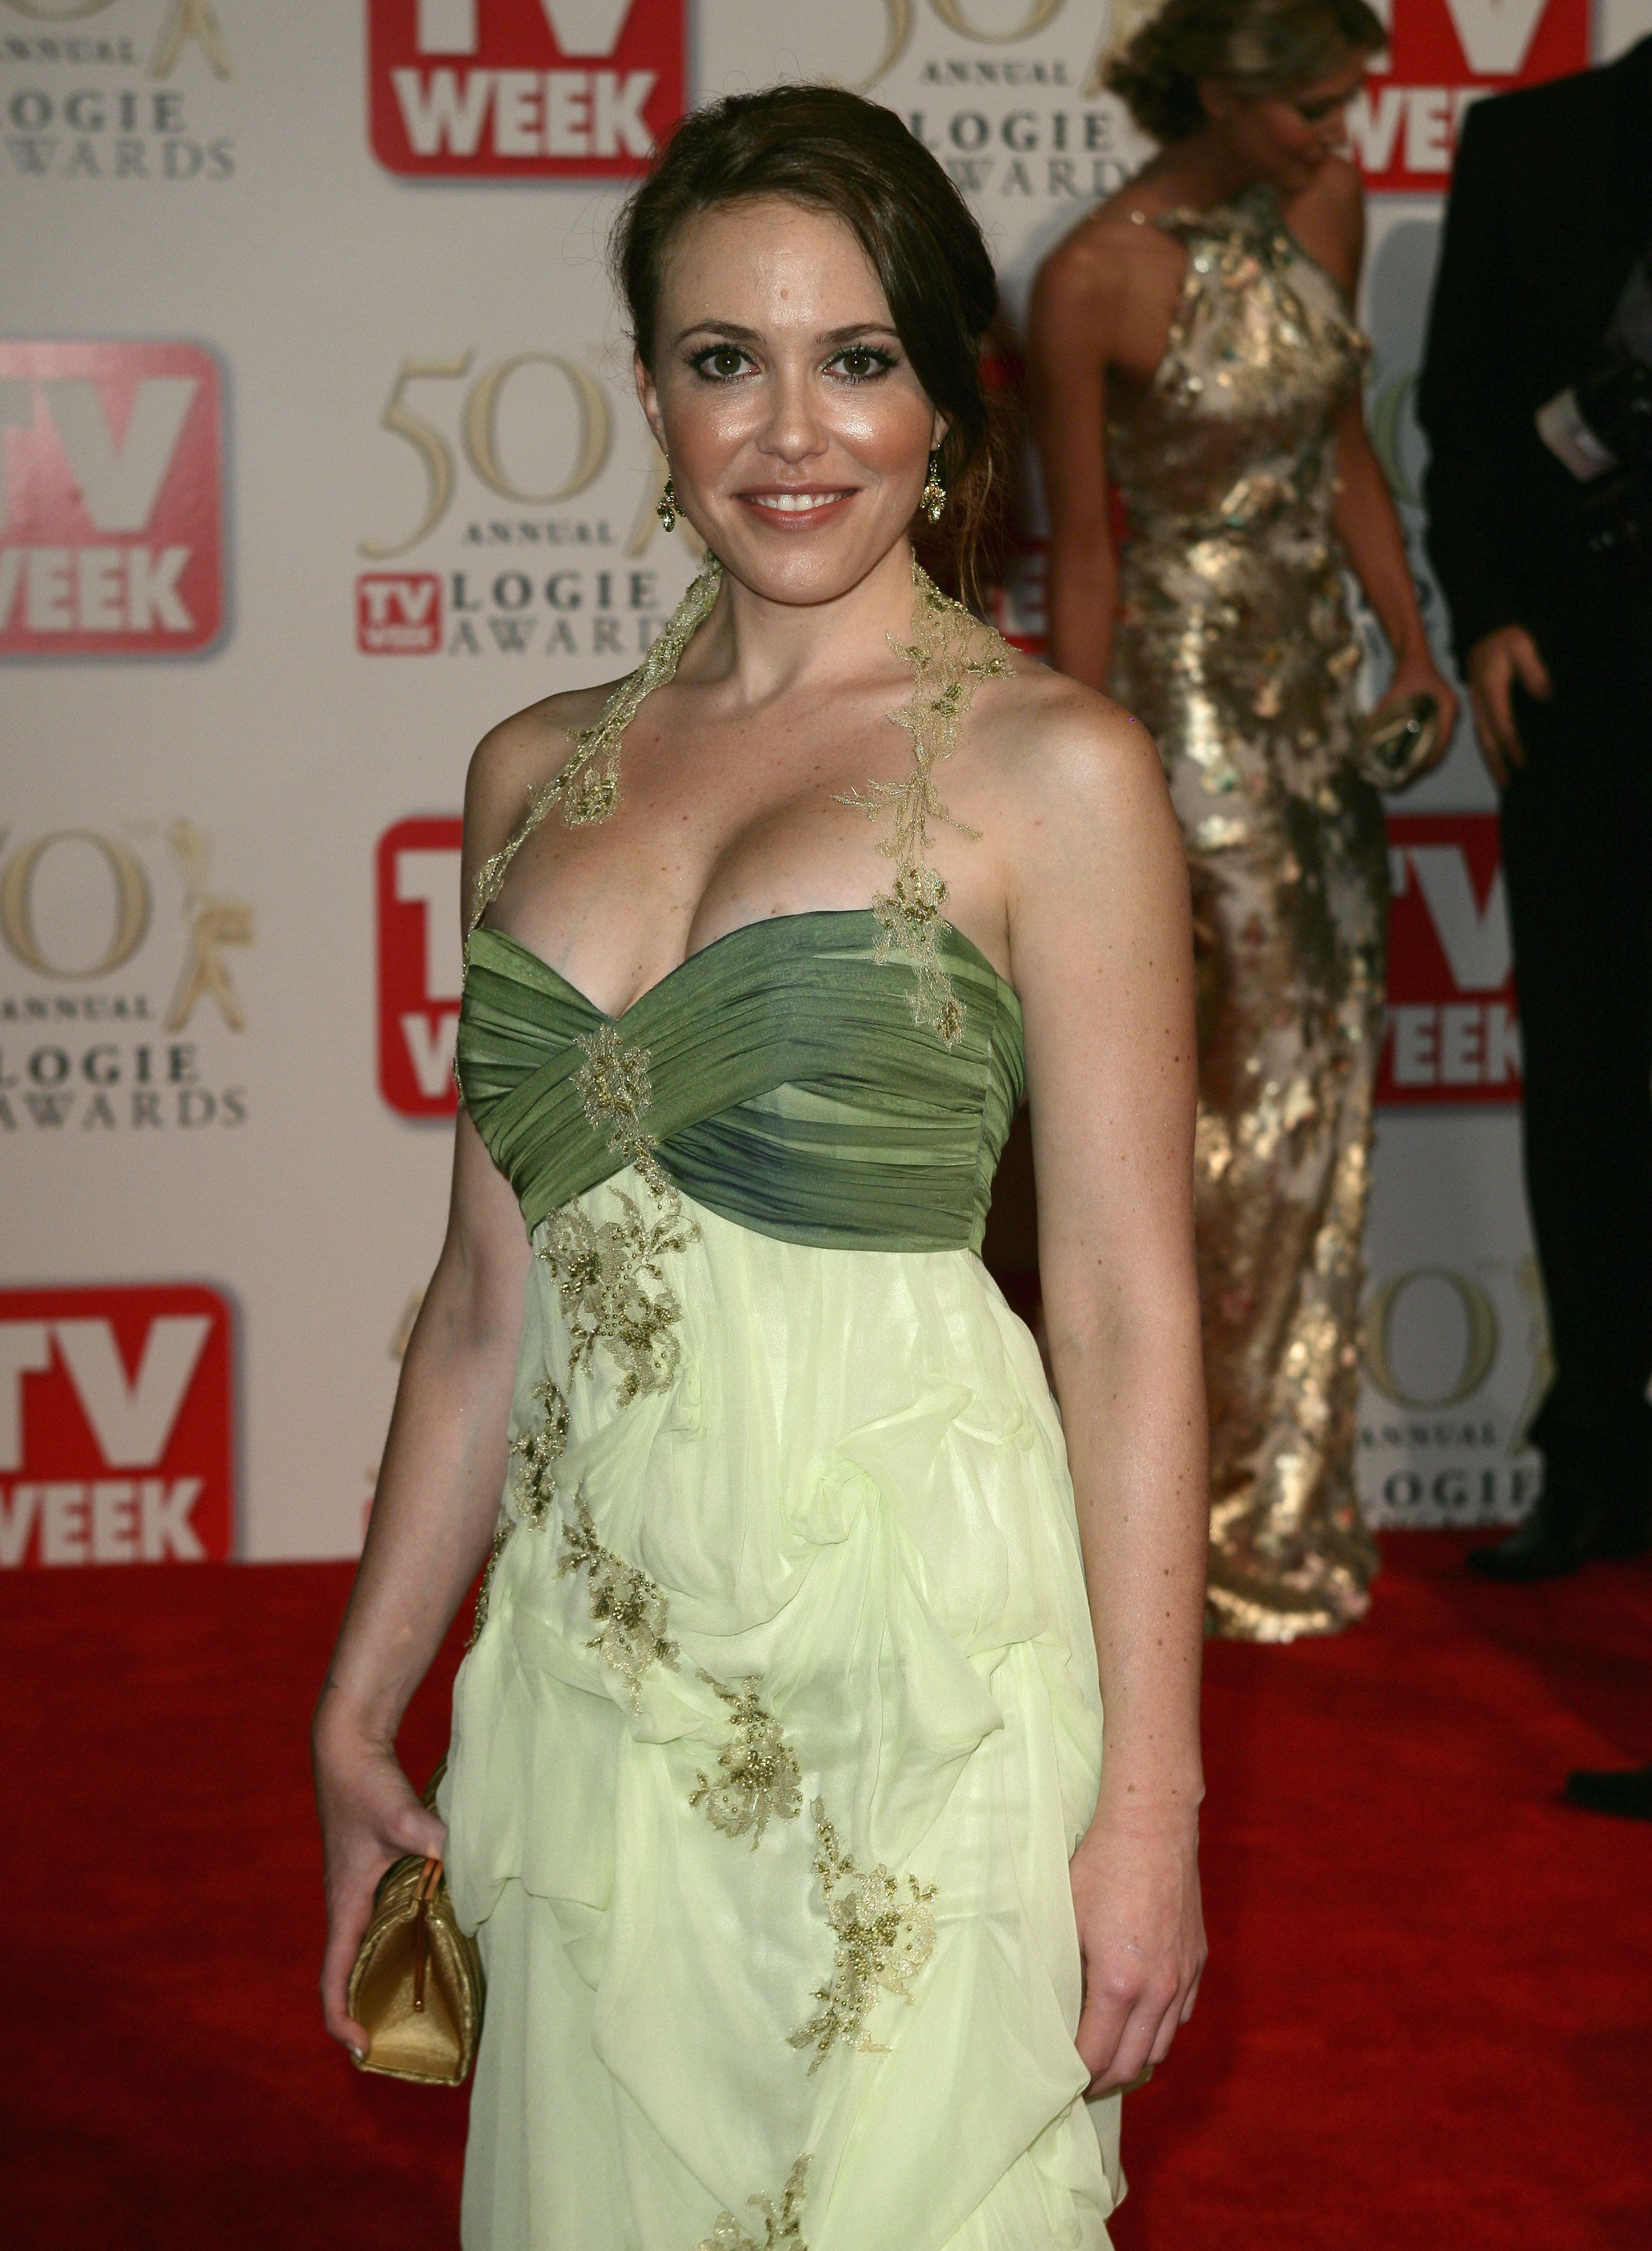 U0027Neighboursu0027 Actress Kym Valentine Has Given Birth To Her Second Child